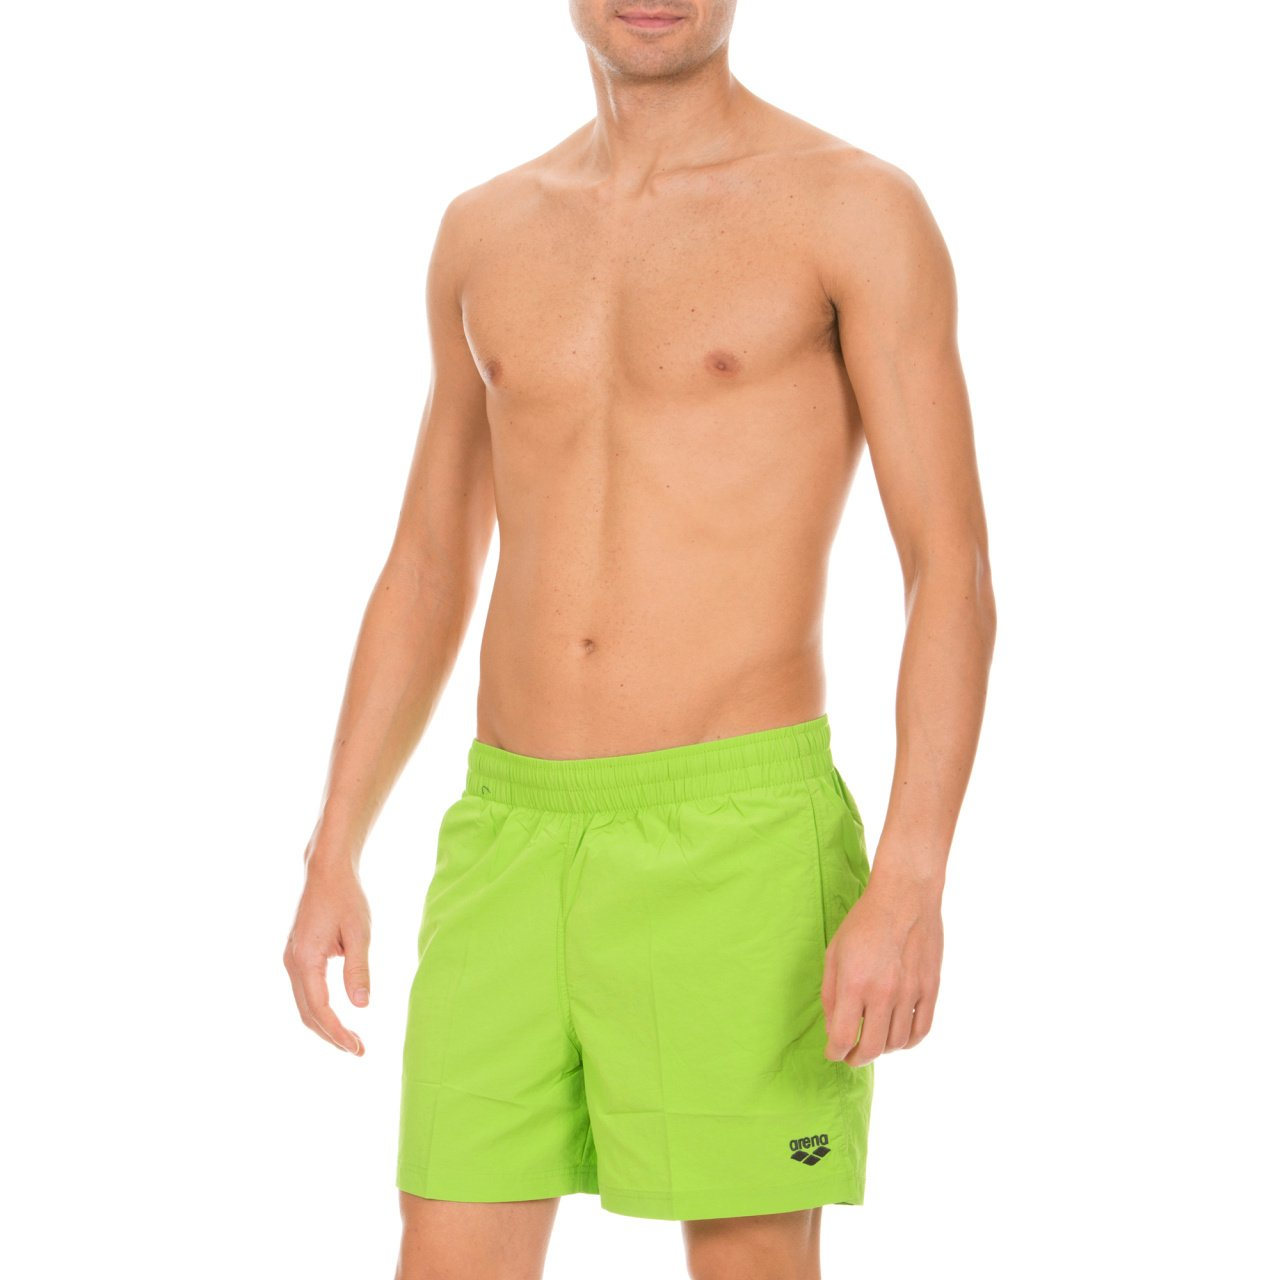 Arena Badeshorts Fundamentals Side Vent Boxer - Bóxer de baño para Hombre, Color Verde,